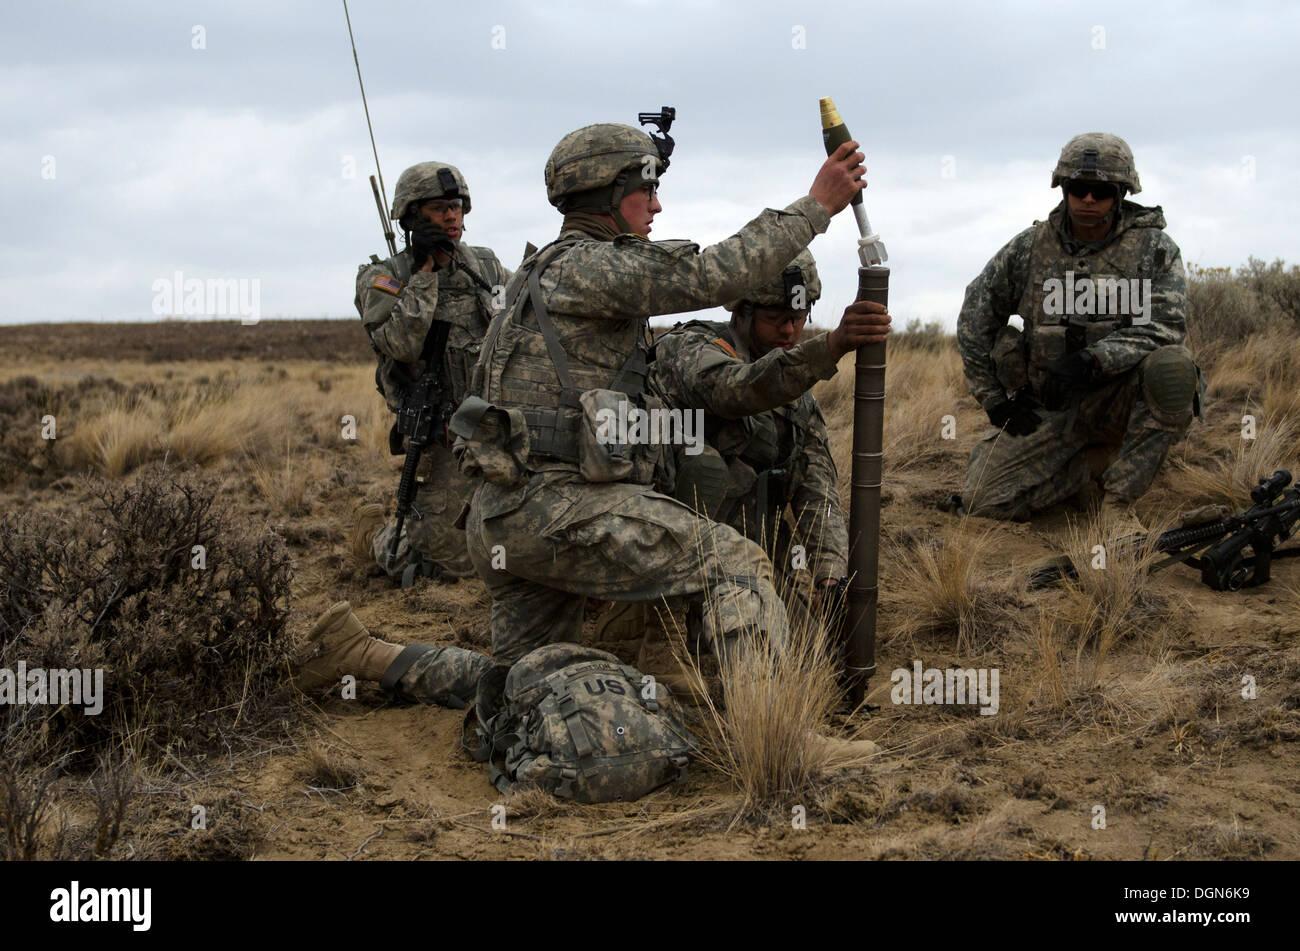 Spc. Bill Savage (right), Company C, 1st Battalion, 23rd Infantry Regiment 'Tomahawks', looks on as Pvt. Daniel Pichardo (left) - Stock Image